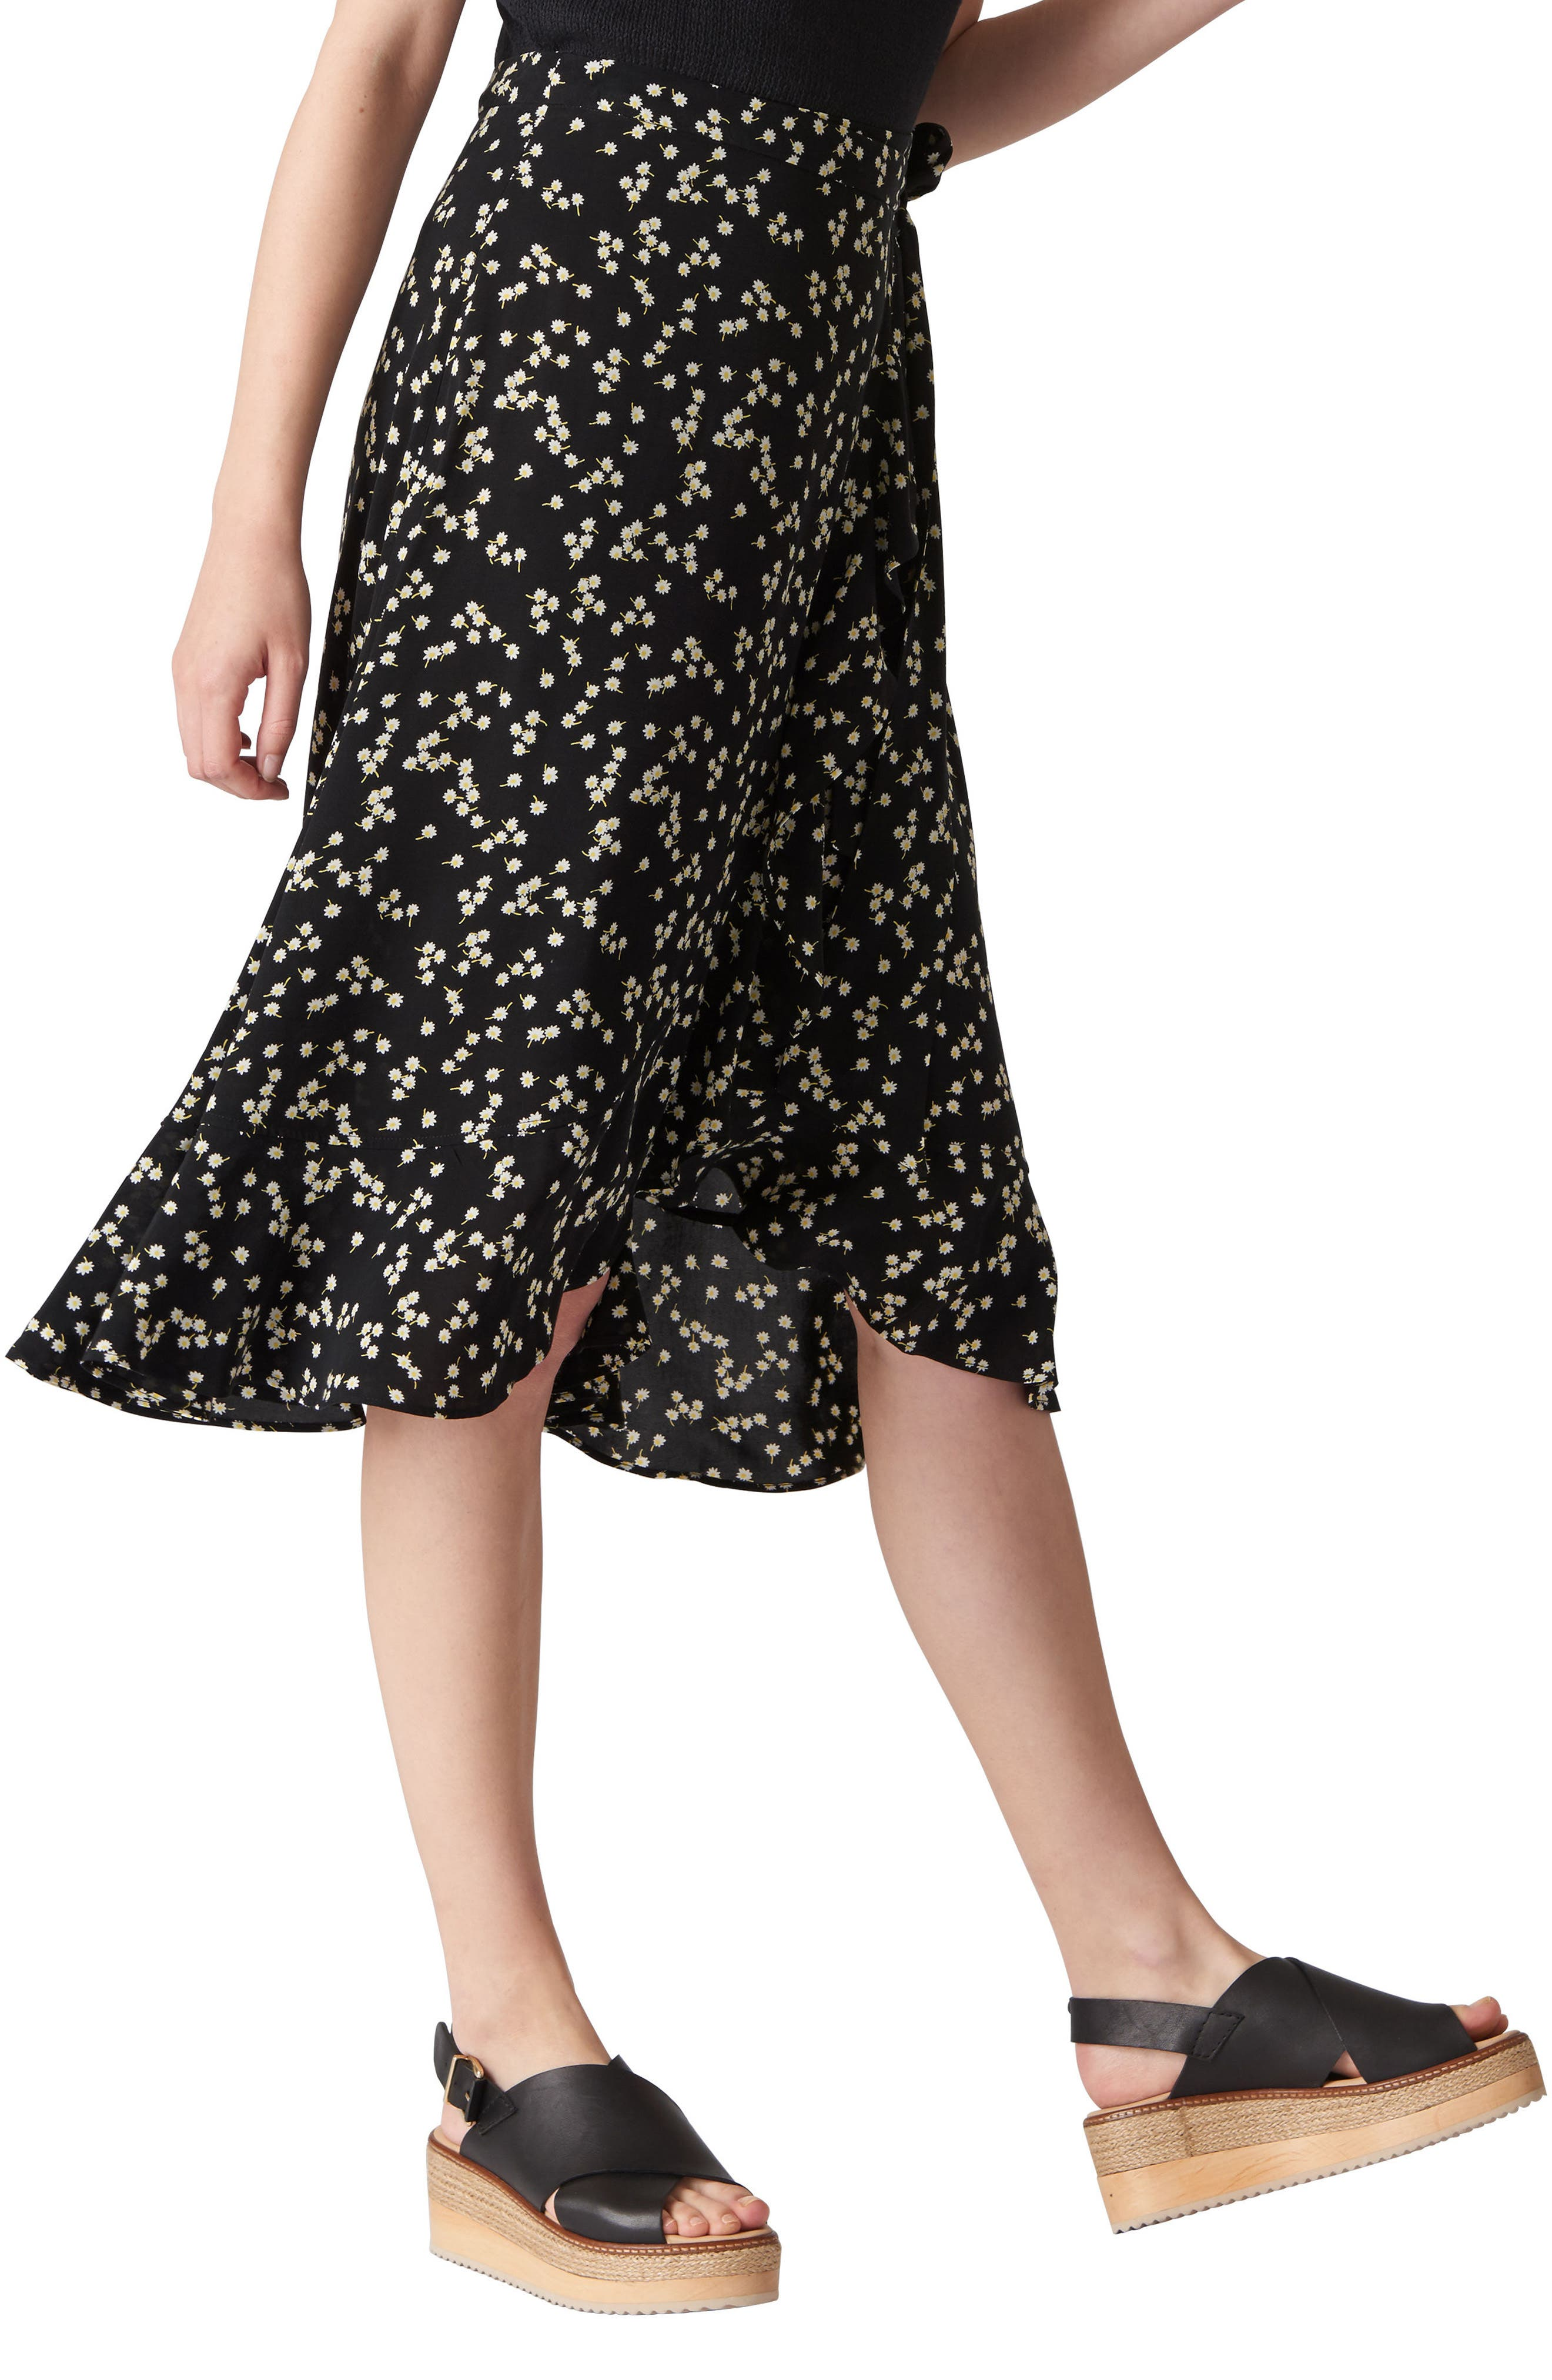 WHISTLES,                             Print Frill Wrap Skirt,                             Main thumbnail 1, color,                             001